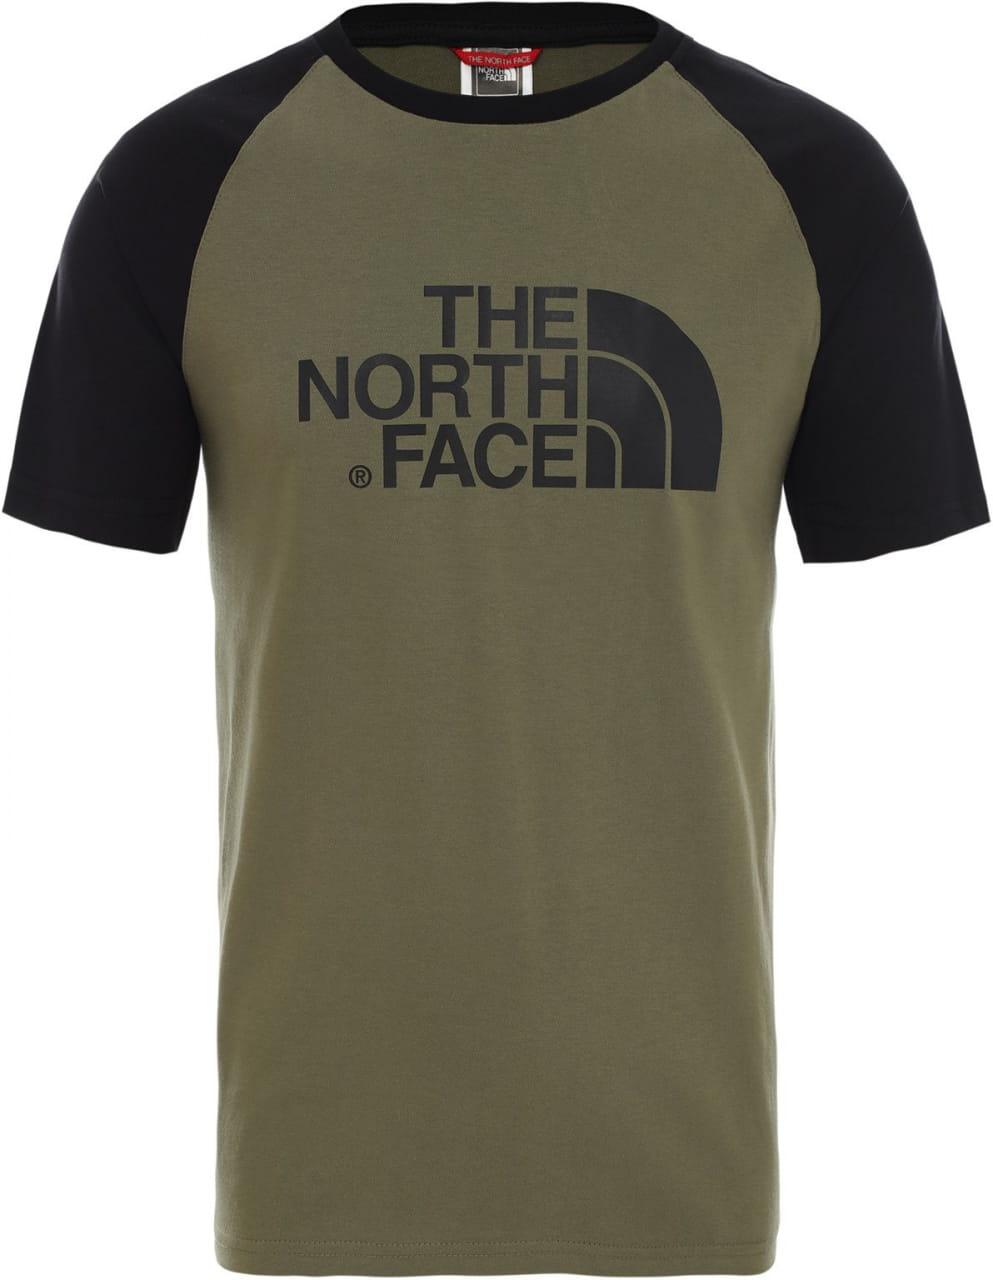 Pánské raglánové tričko The North Face Men's Raglan Easy T-Shirt